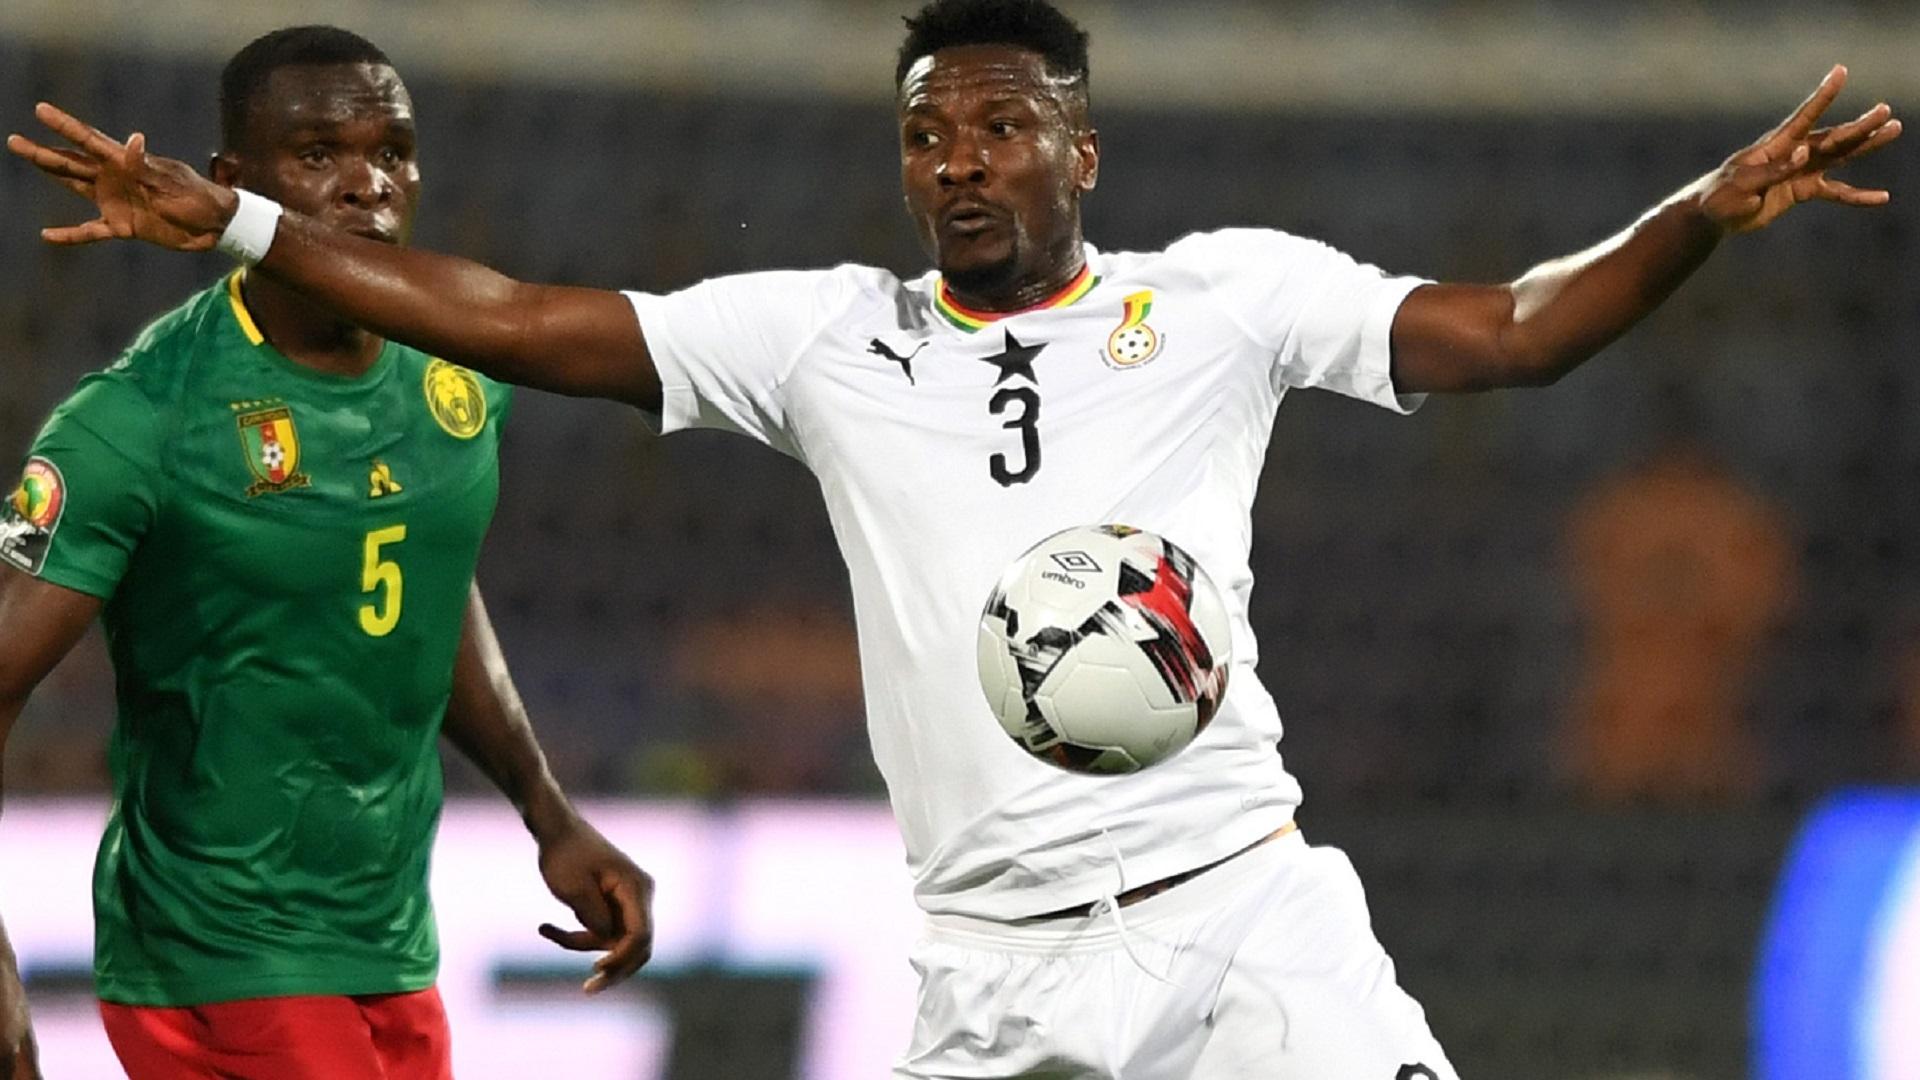 2019 Africa Cup of Nations: Kayserispor striker Asamoah Gyan coy on retirement from international football